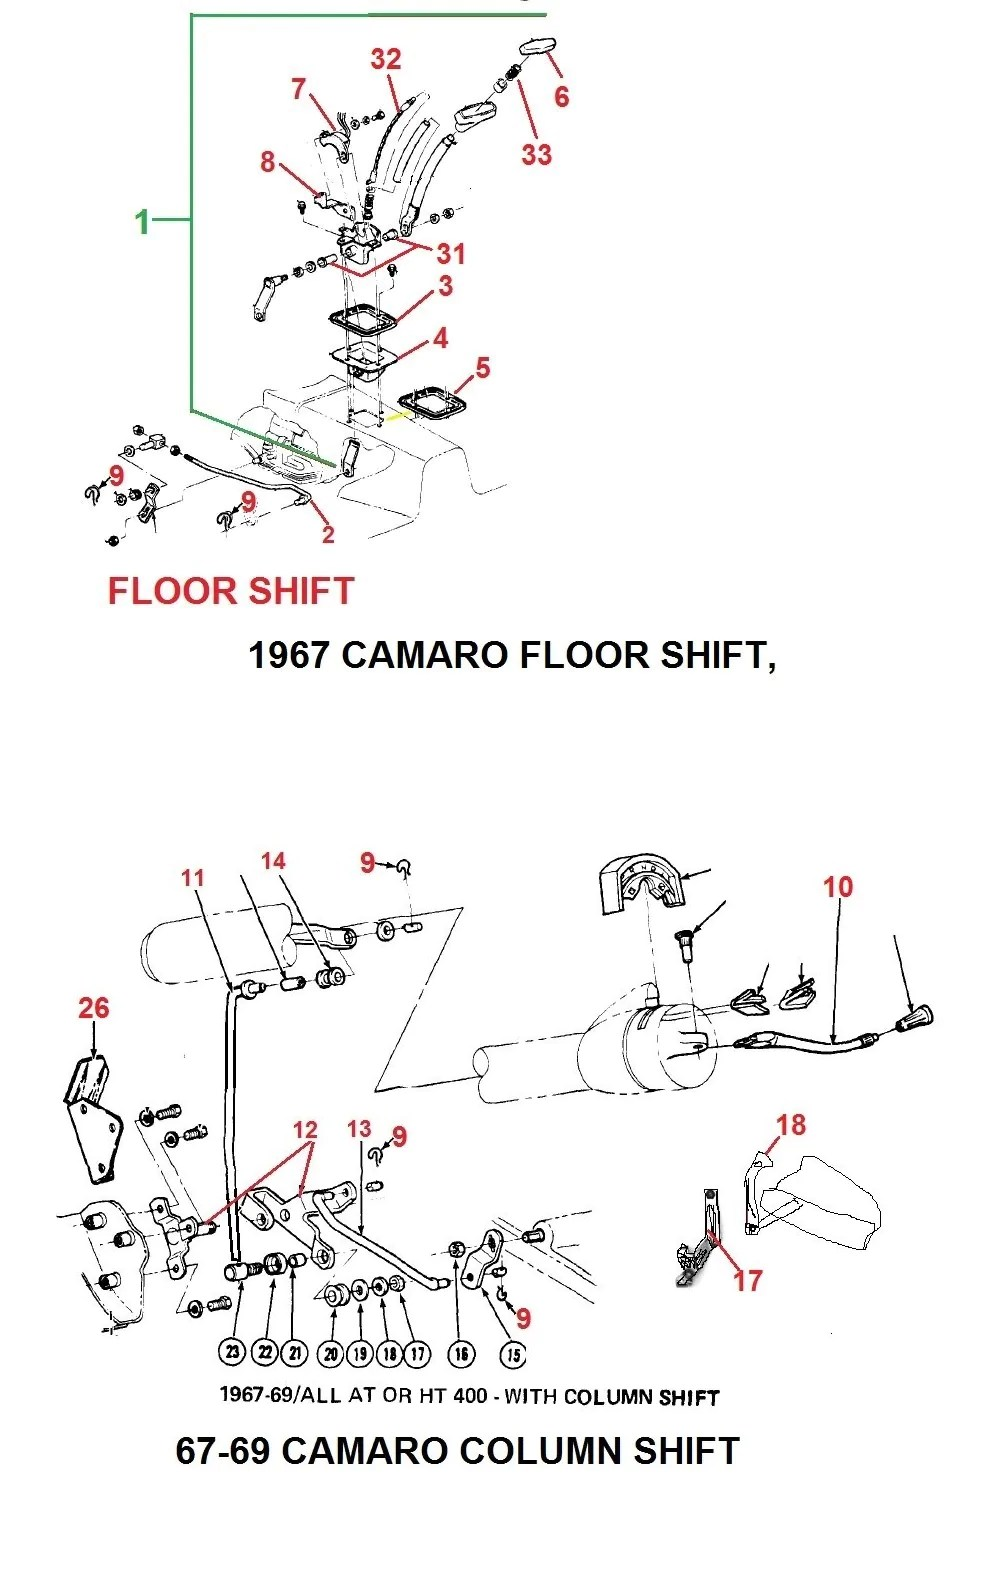 hight resolution of 1967 camaro auto floor shifter 67 69 camaro column shift parts